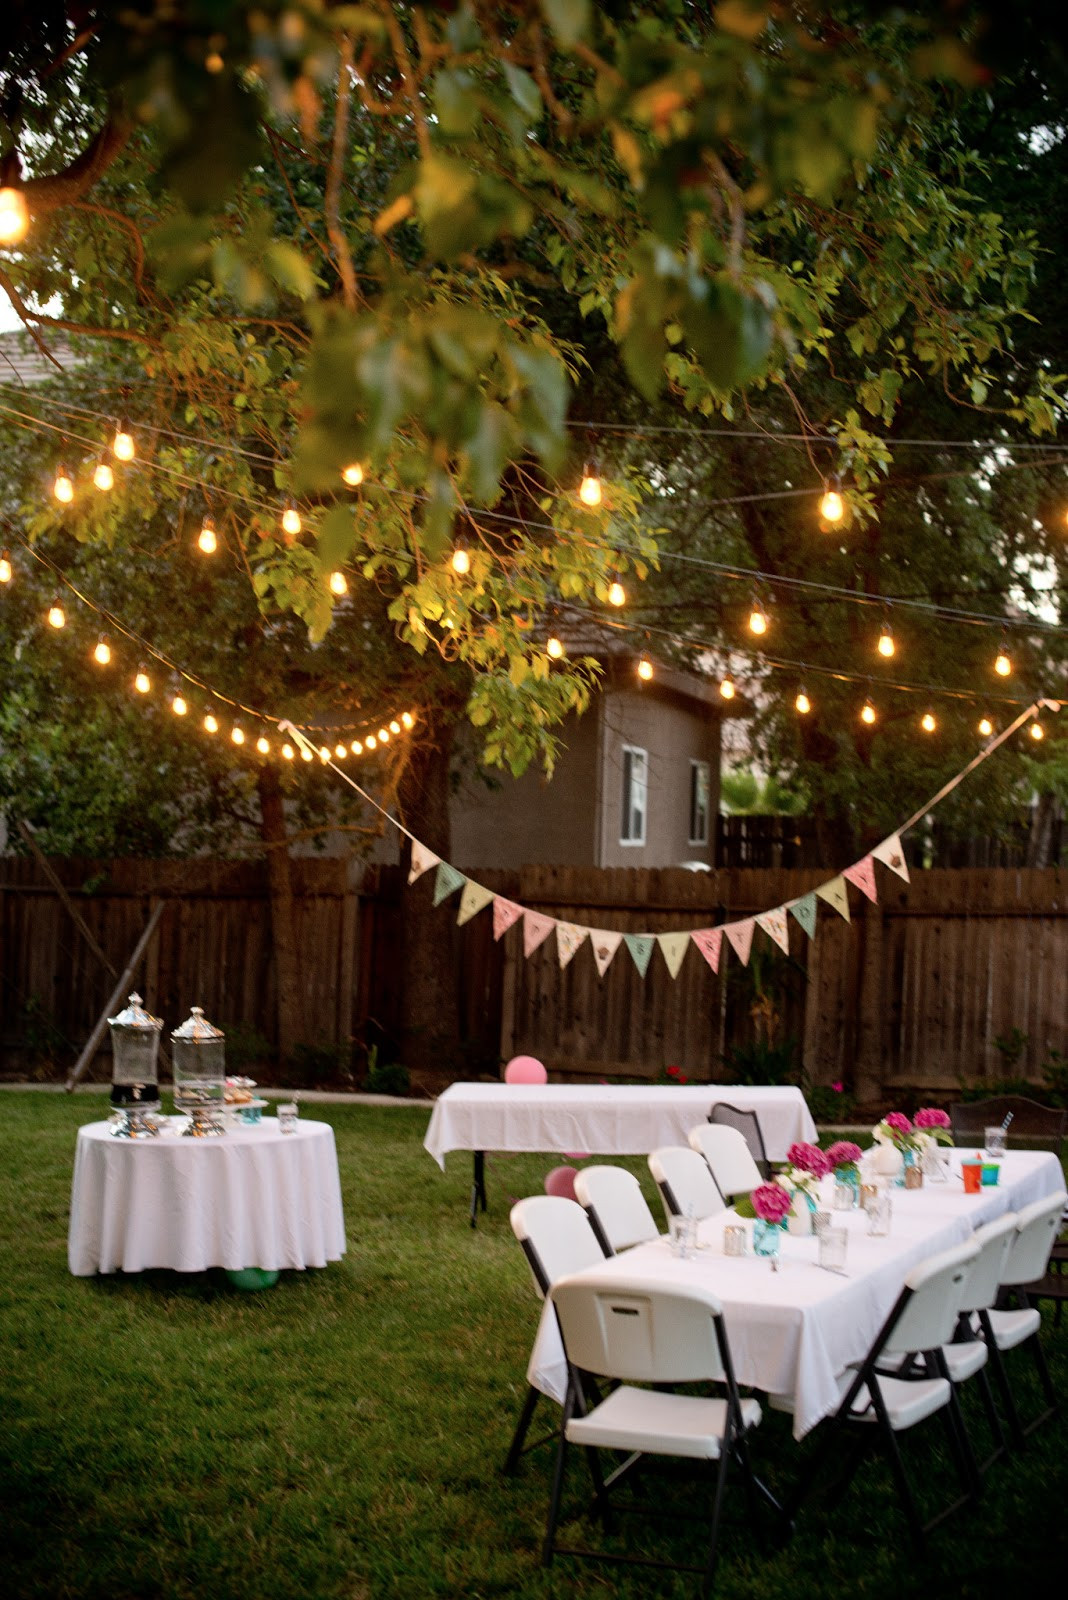 Backyard Party Set Up Ideas  Domestic Fashionista Backyard Birthday Fun Pink